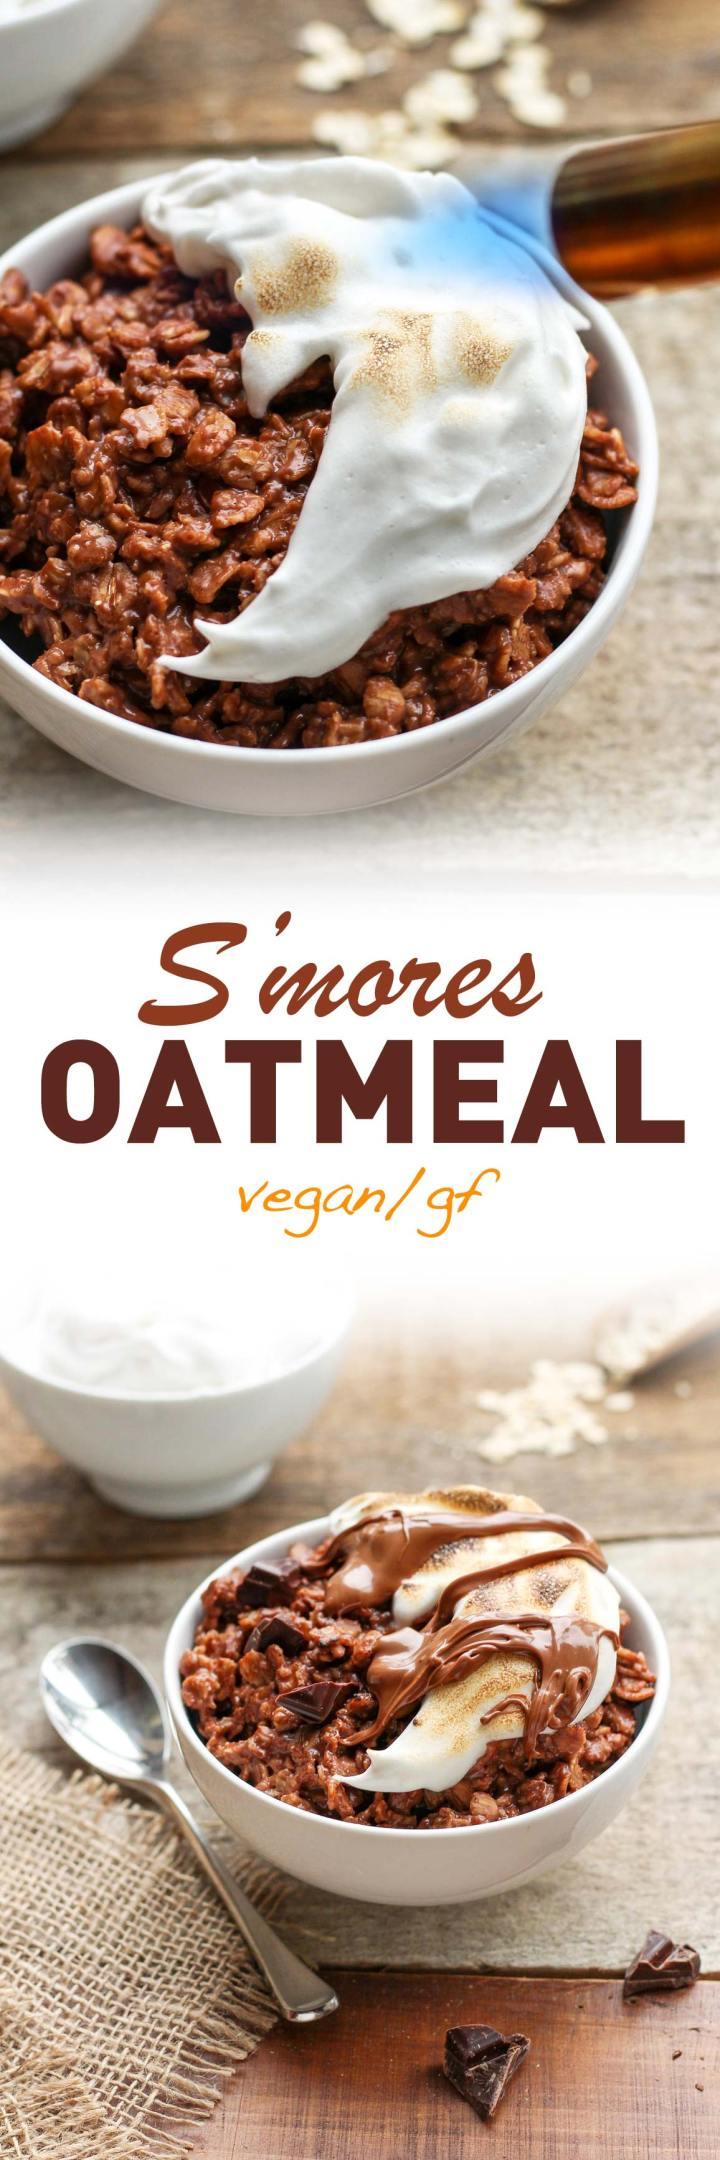 Vegan S'mores Chocolate Oatmeal